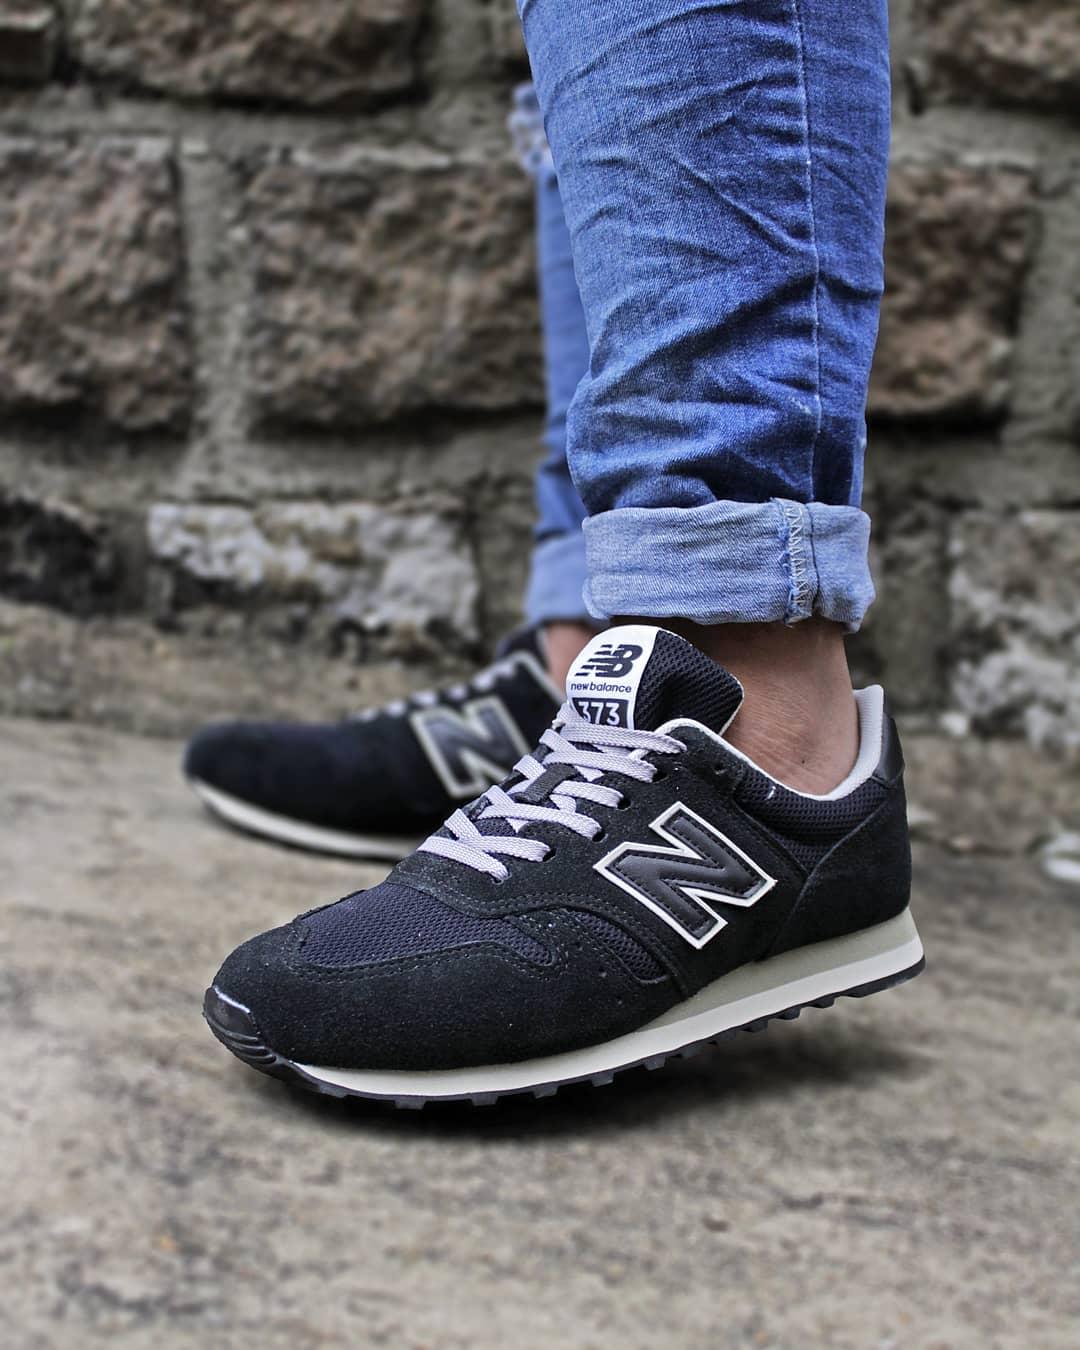 New balance 373 masculino preto 4